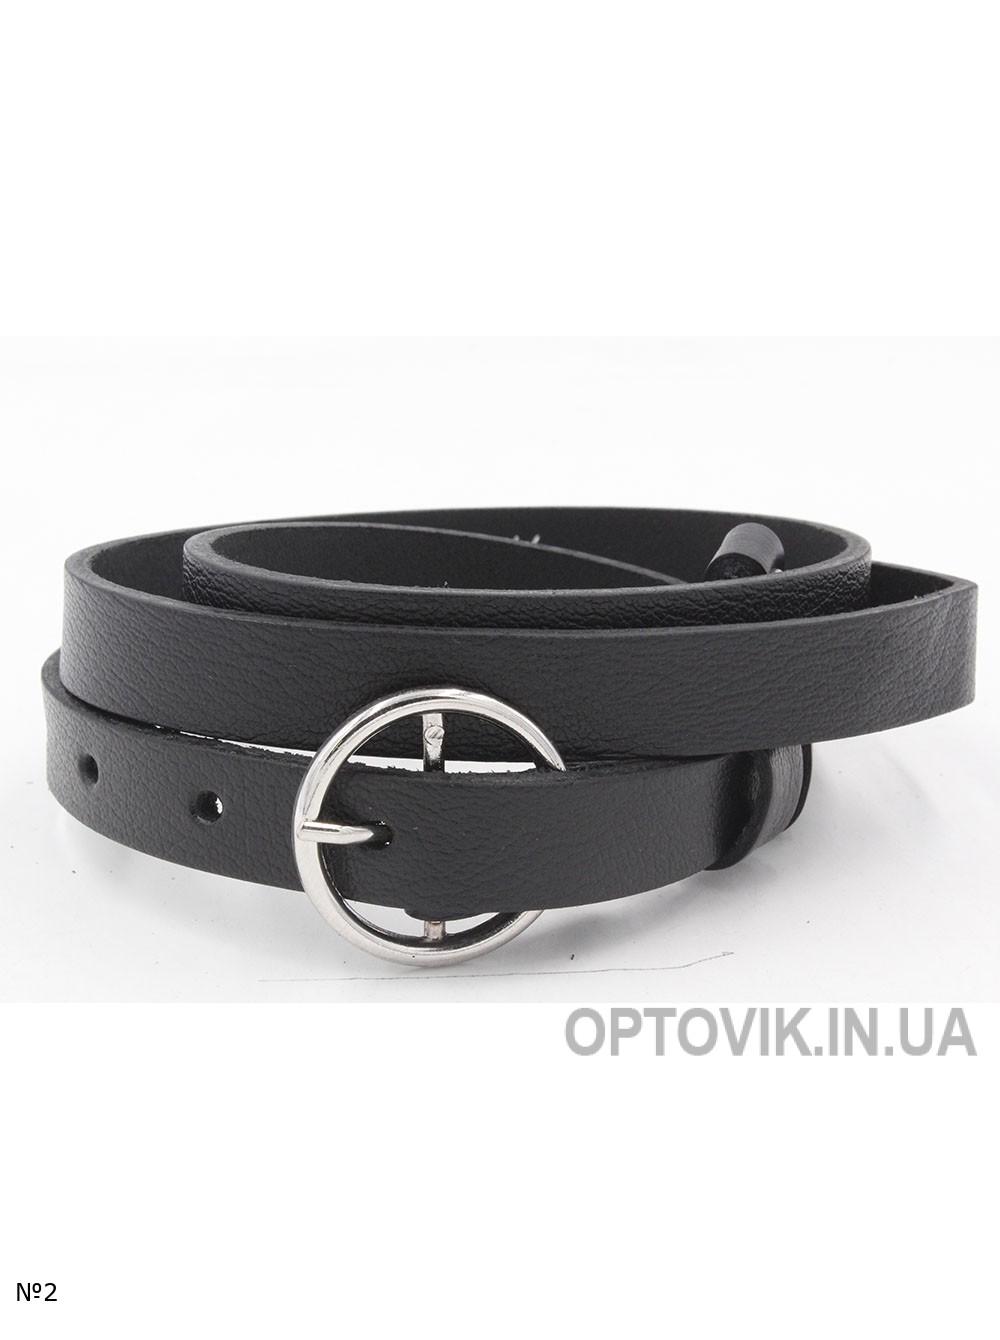 Ремень кожа 20 Real Leather - rl140259